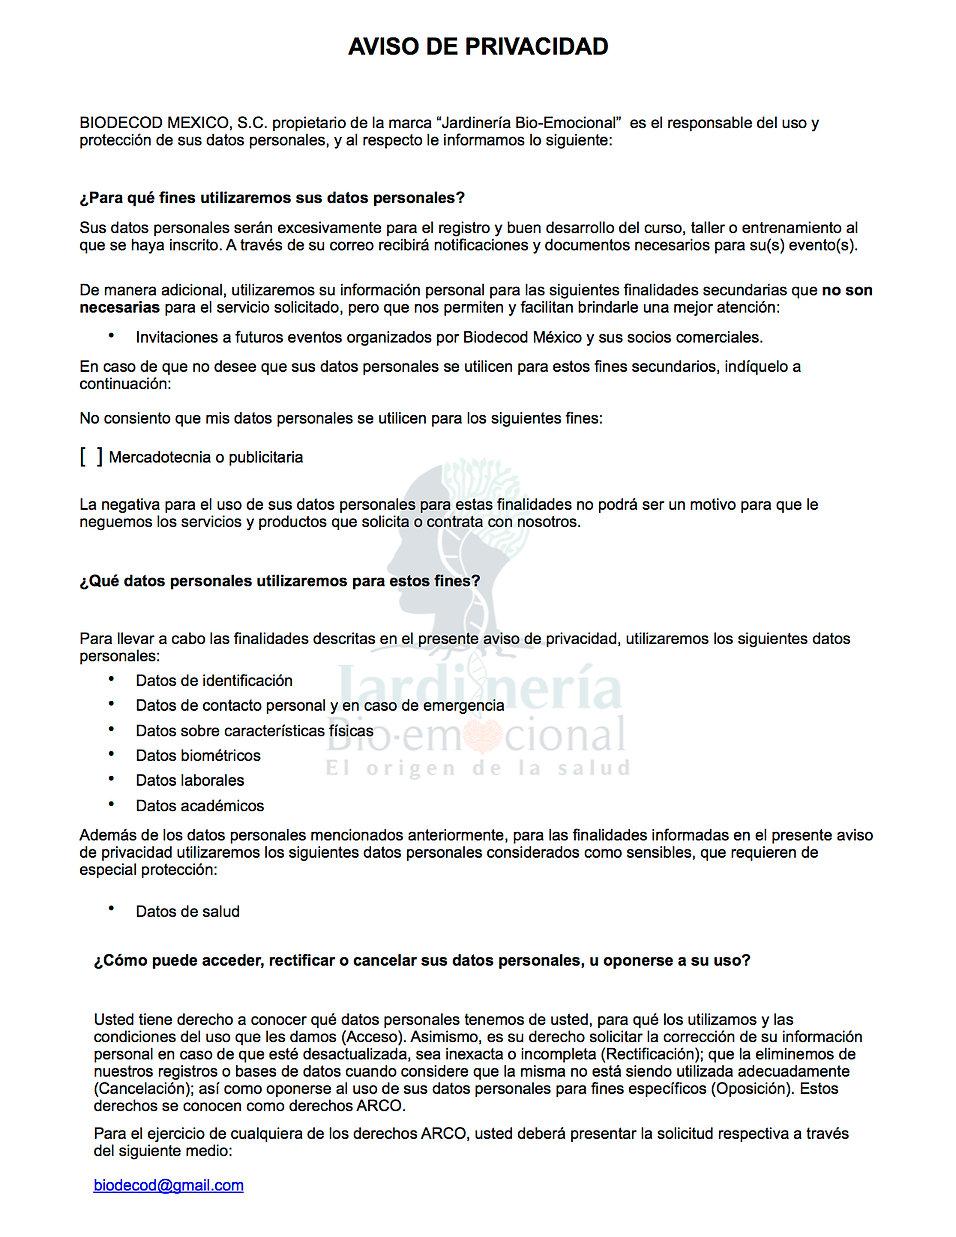 Aviso_de_privacidad__-_Biodecod_México.j